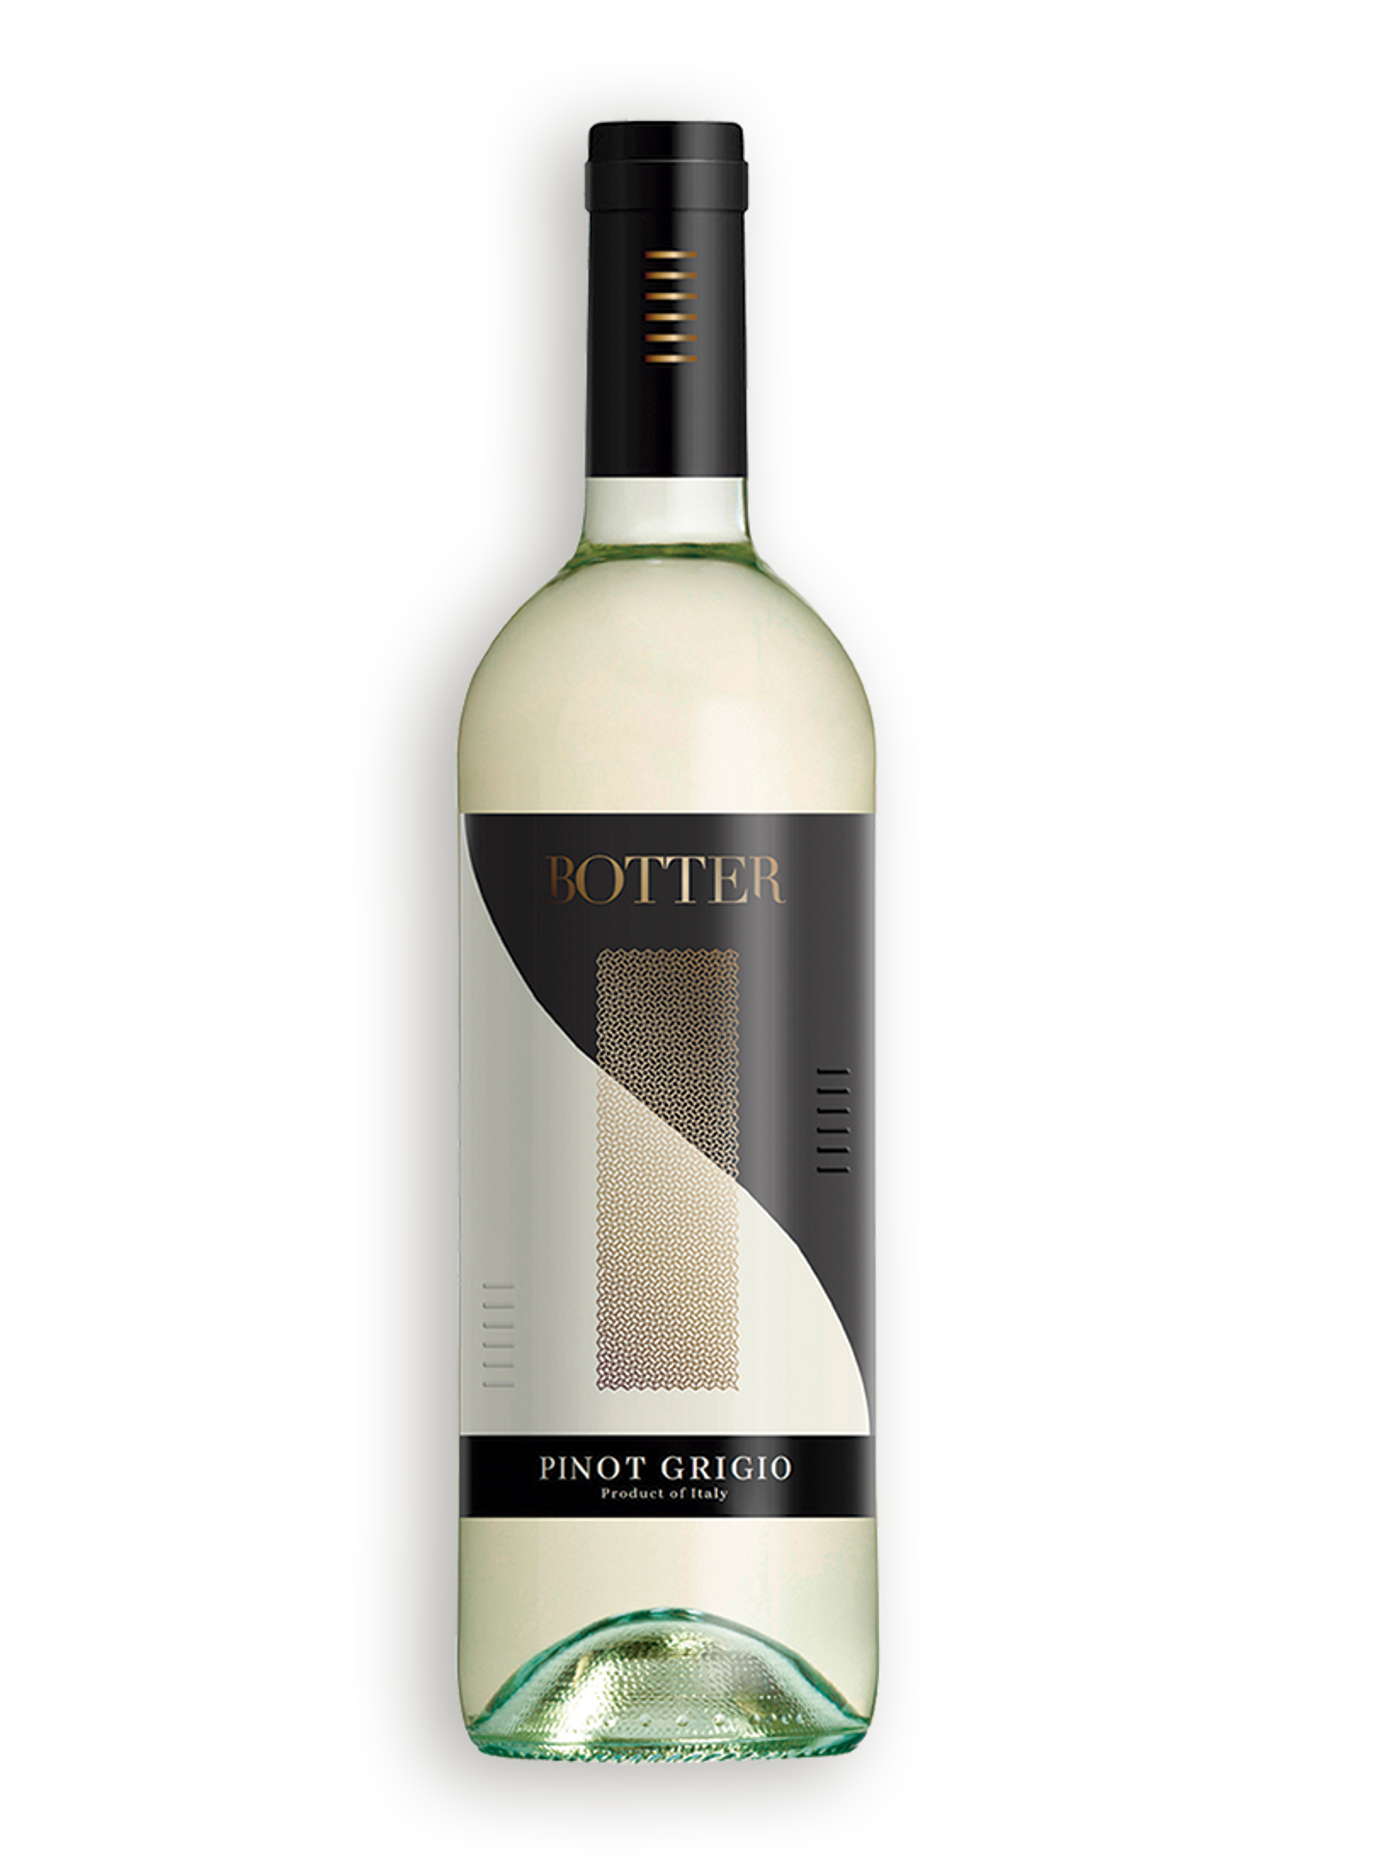 Pinot grigio delle venezie D.O.C.